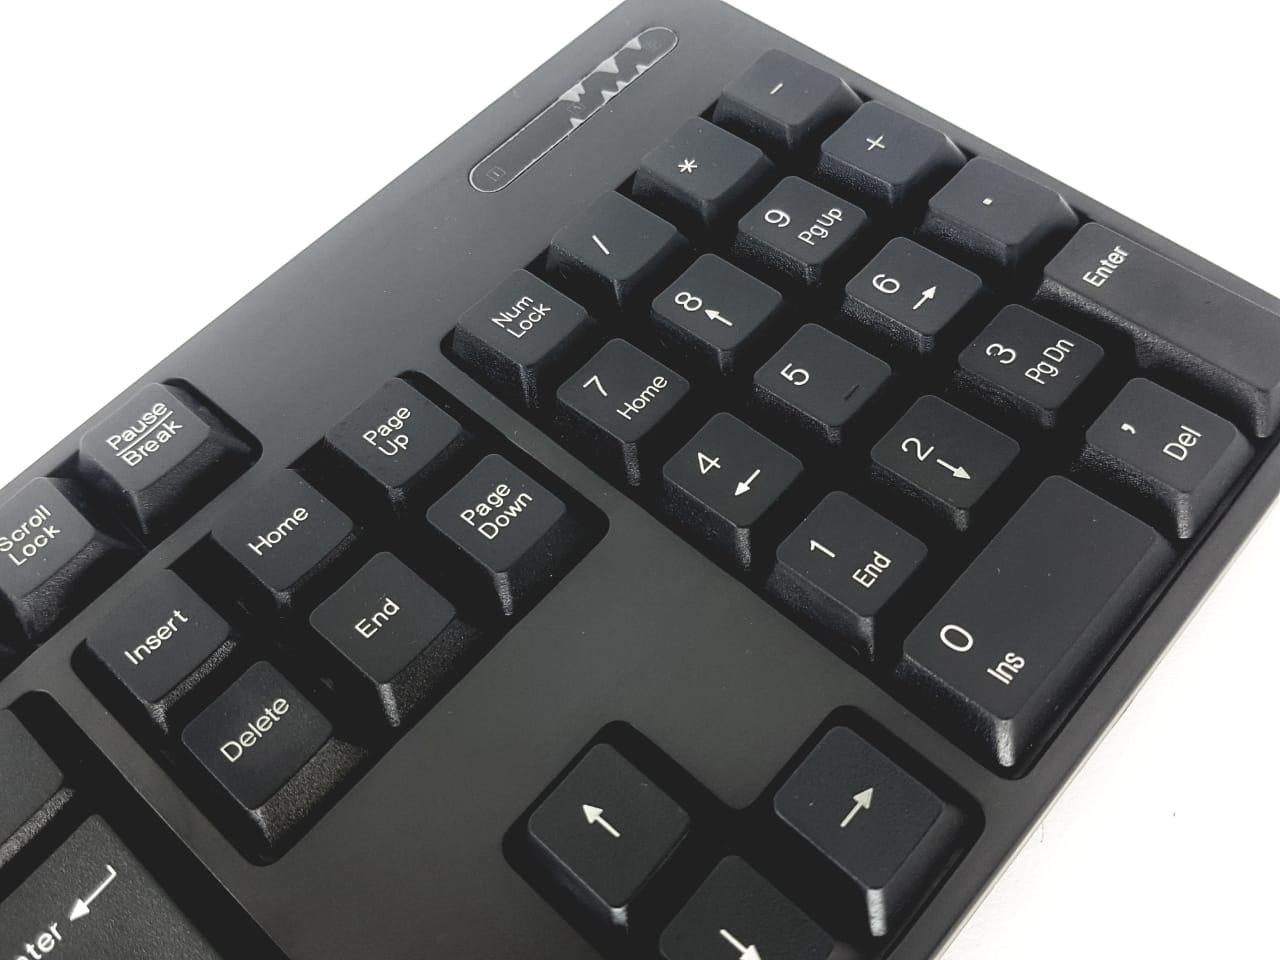 Teclado USB preto Standard Keyboard K305-B com Ç Abnt2